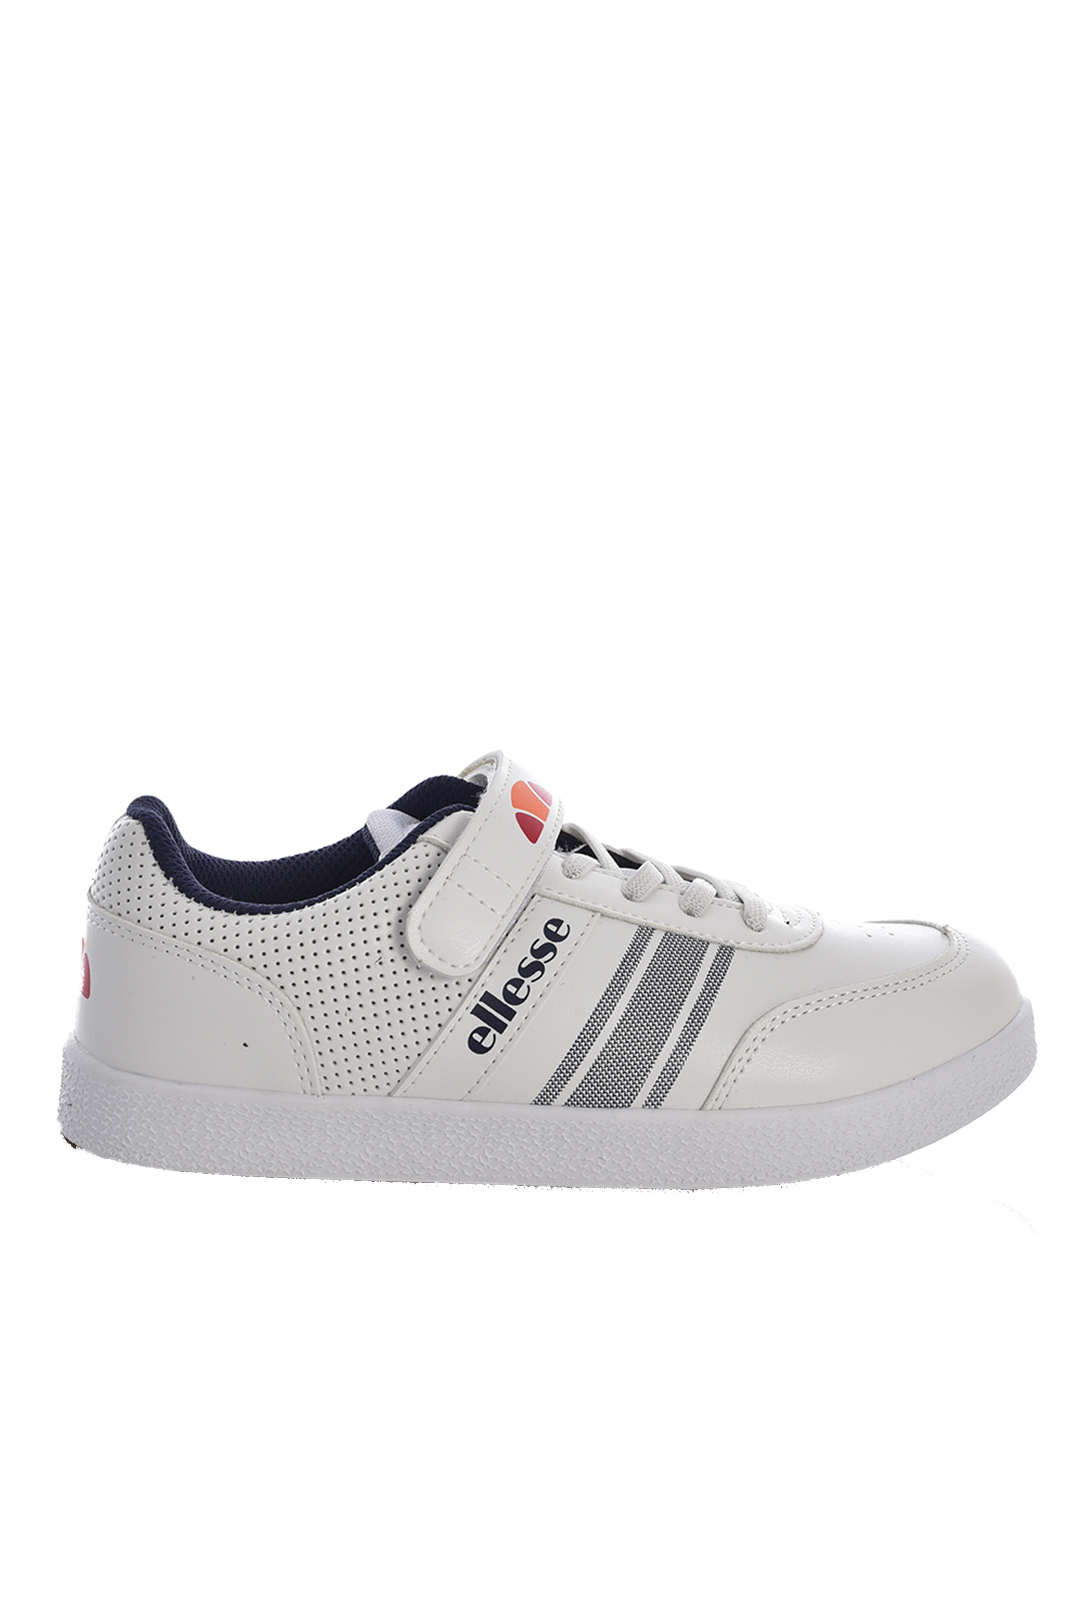 Chaussures  Ellesse EL916405 Figaro WHITE